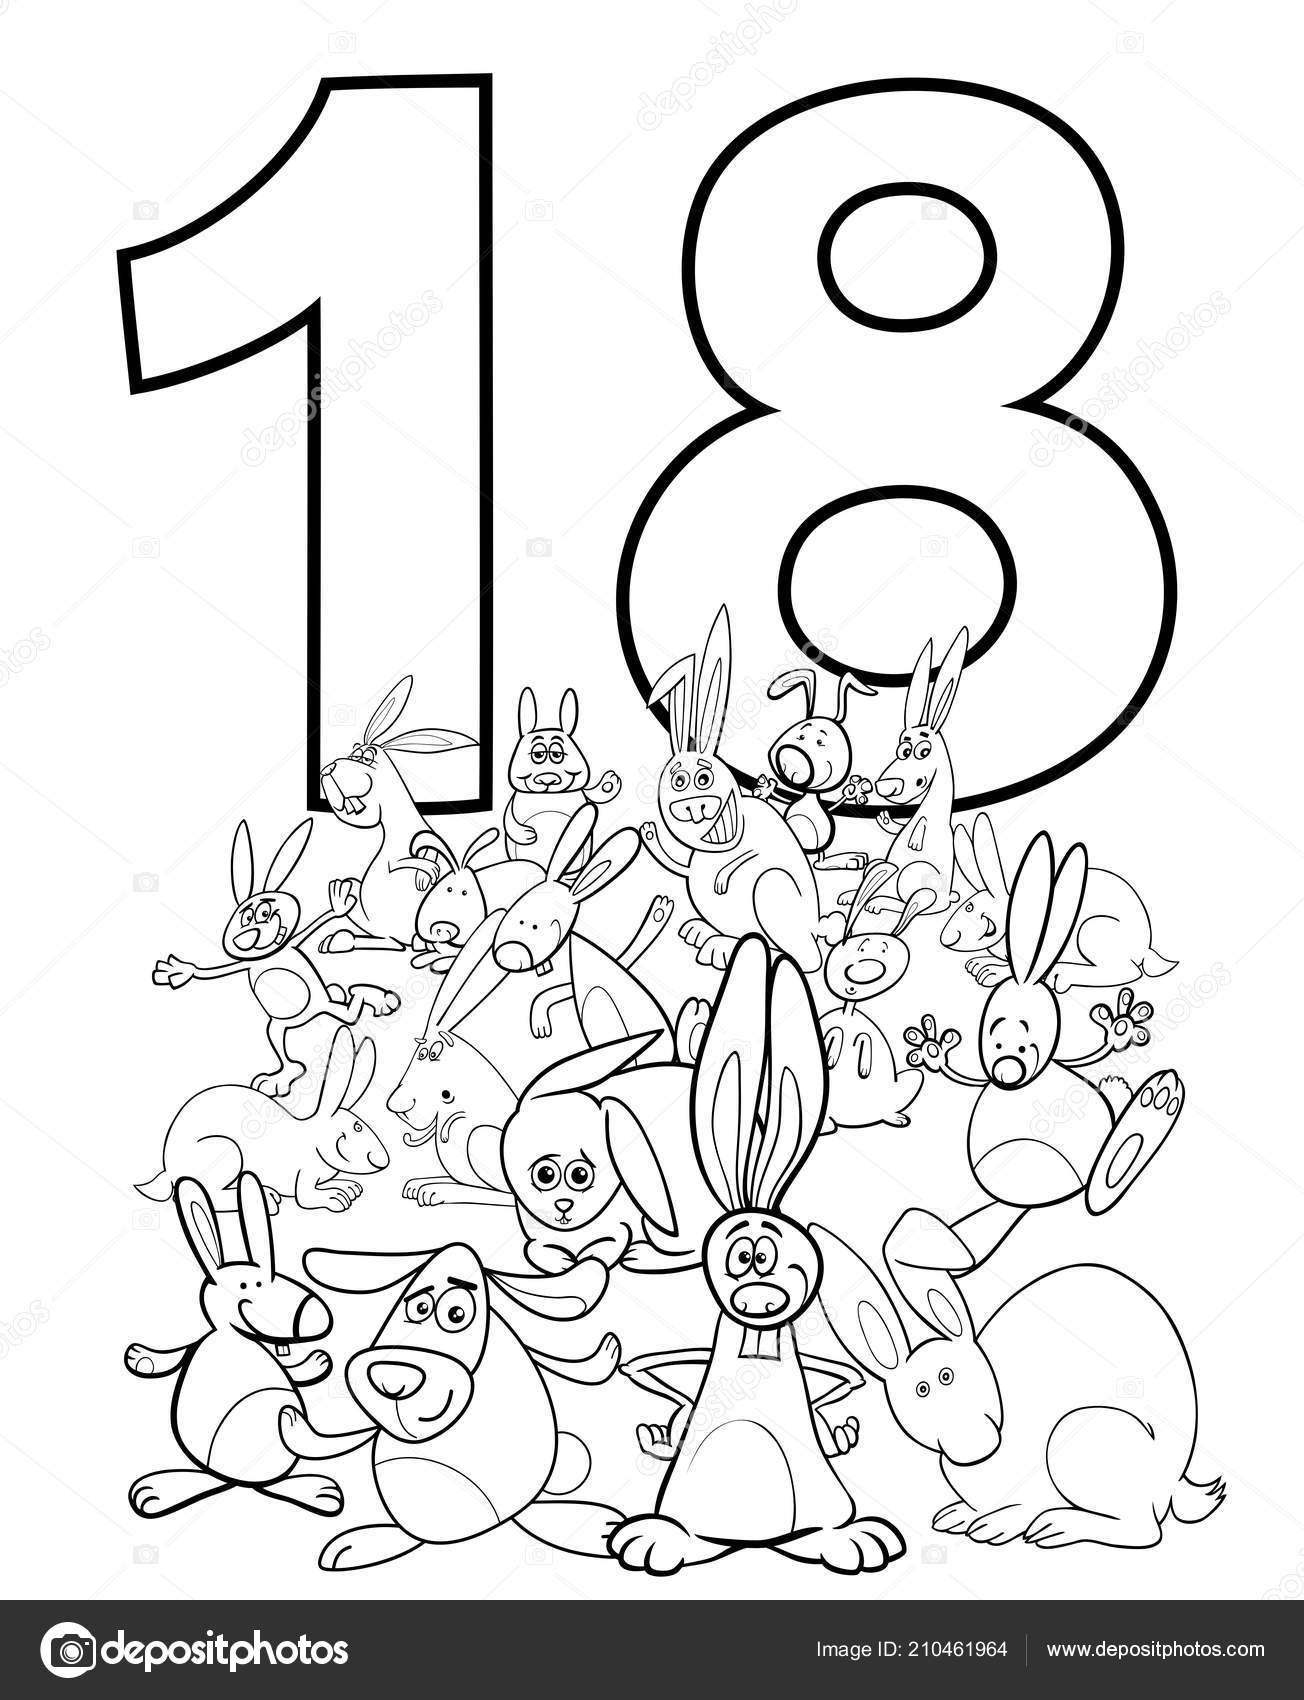 Ilustracion Dibujos Animados Blanco Negro Numerociocho